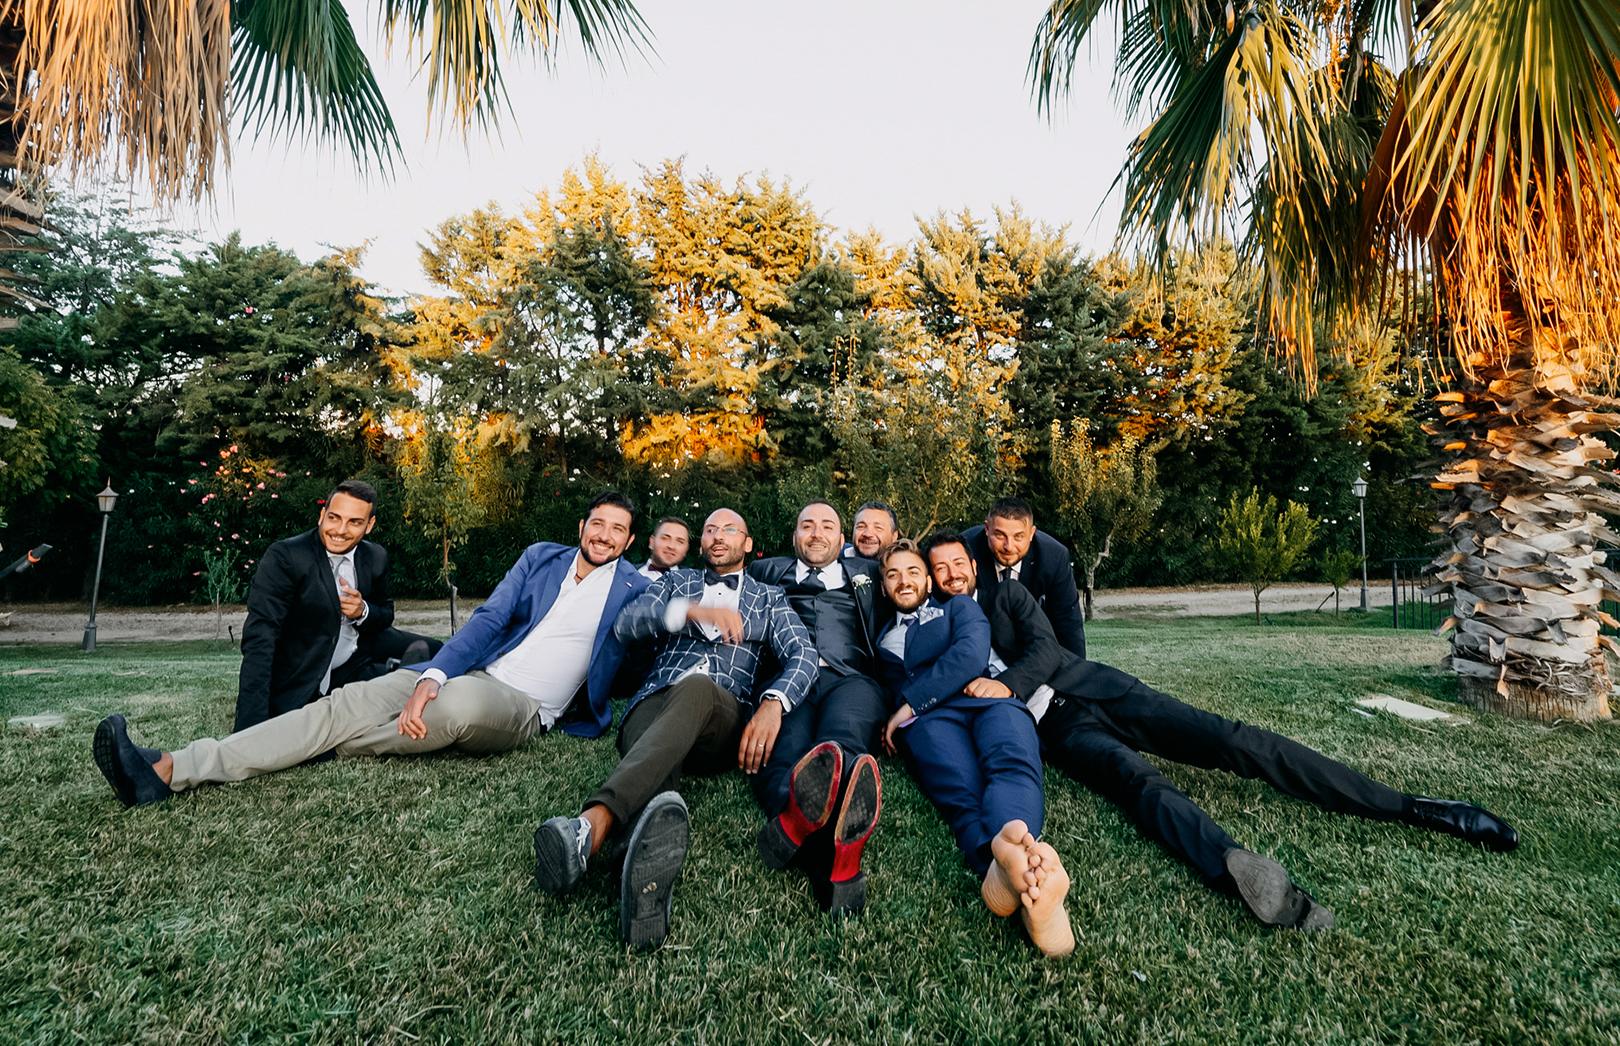 35 gianni-lepore-foto-amici-sposo-lucera